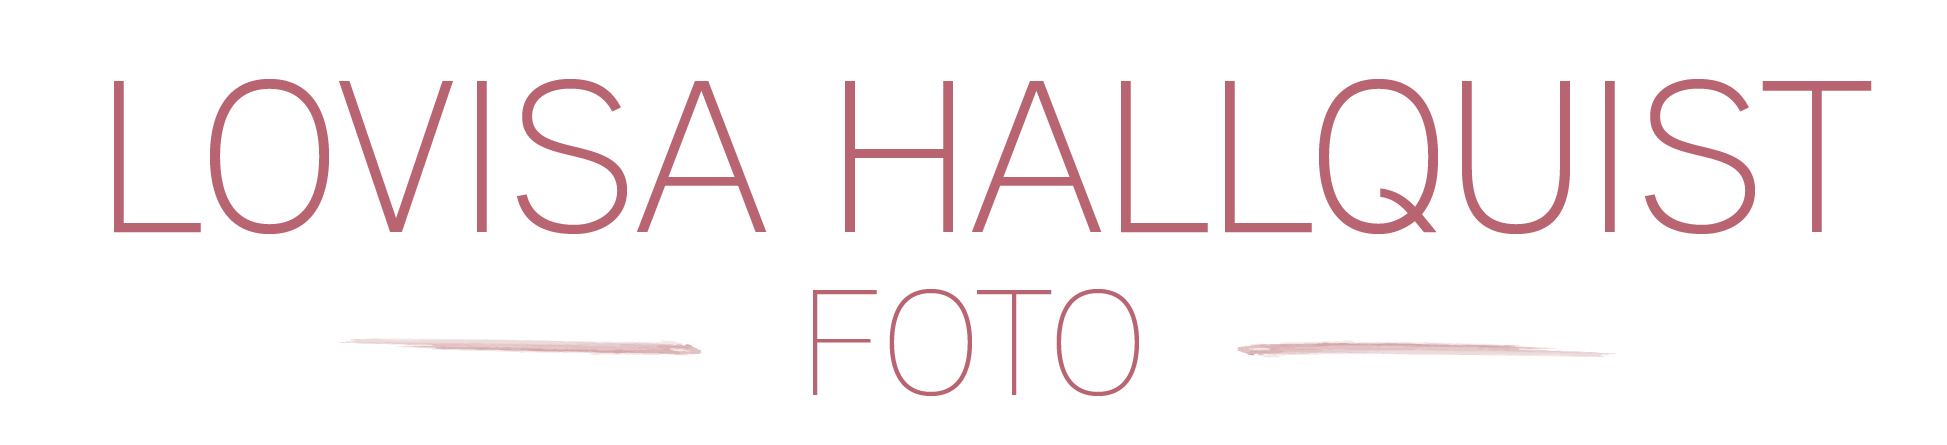 Lovisa Hallquist